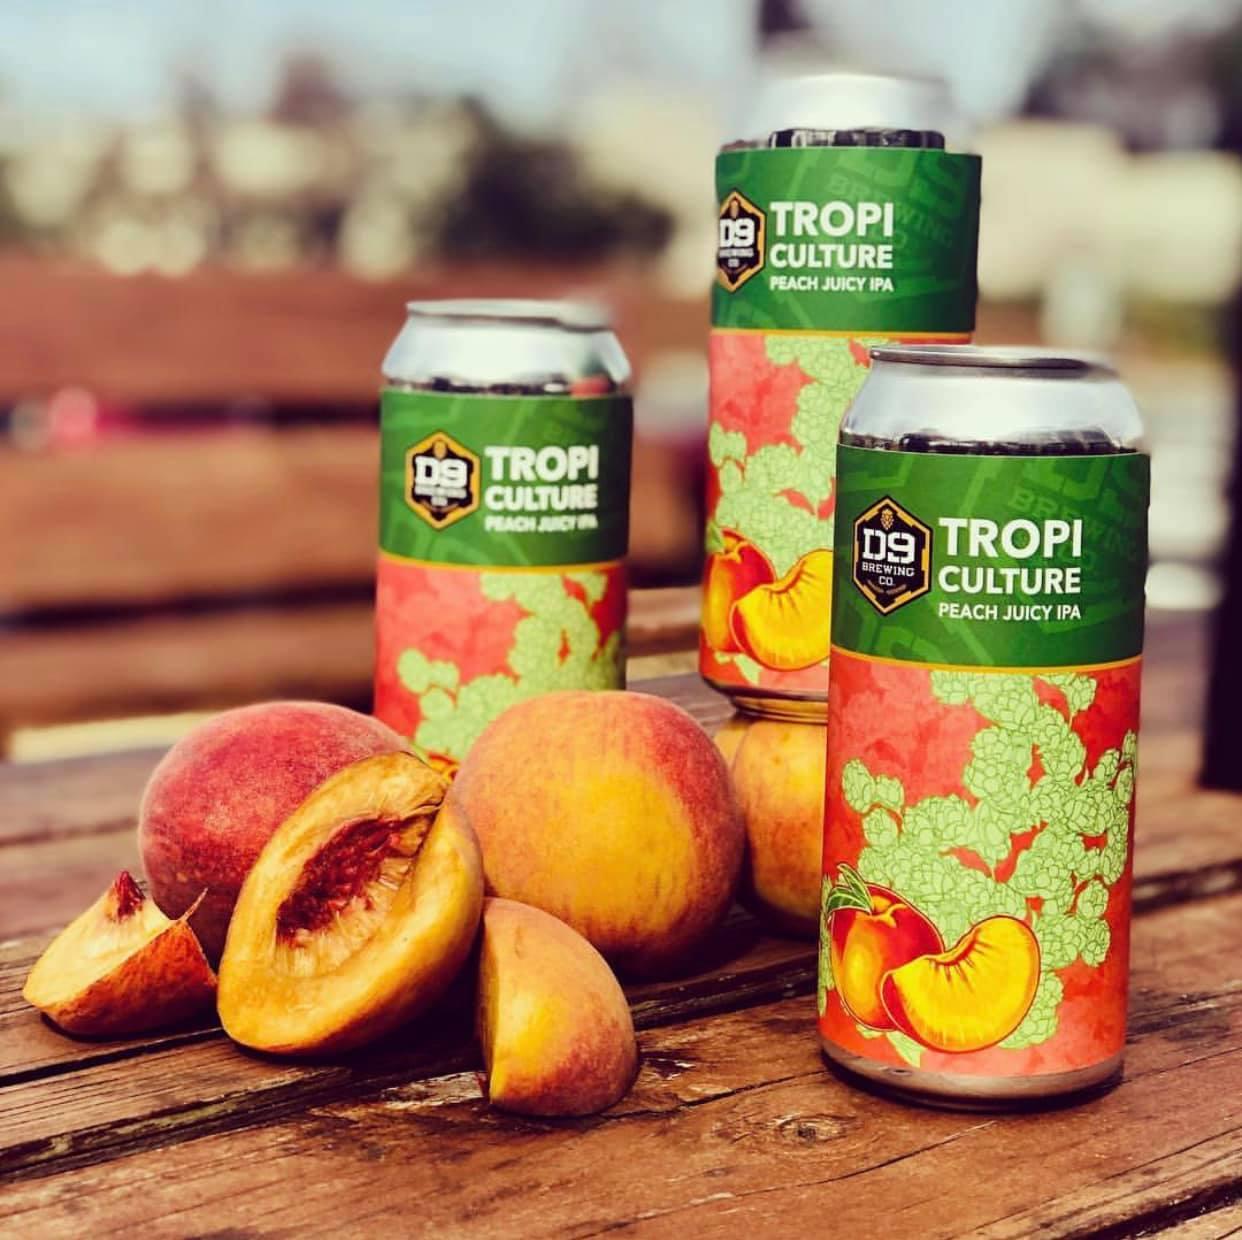 D9 Tropiculture Peach Jucy IPA